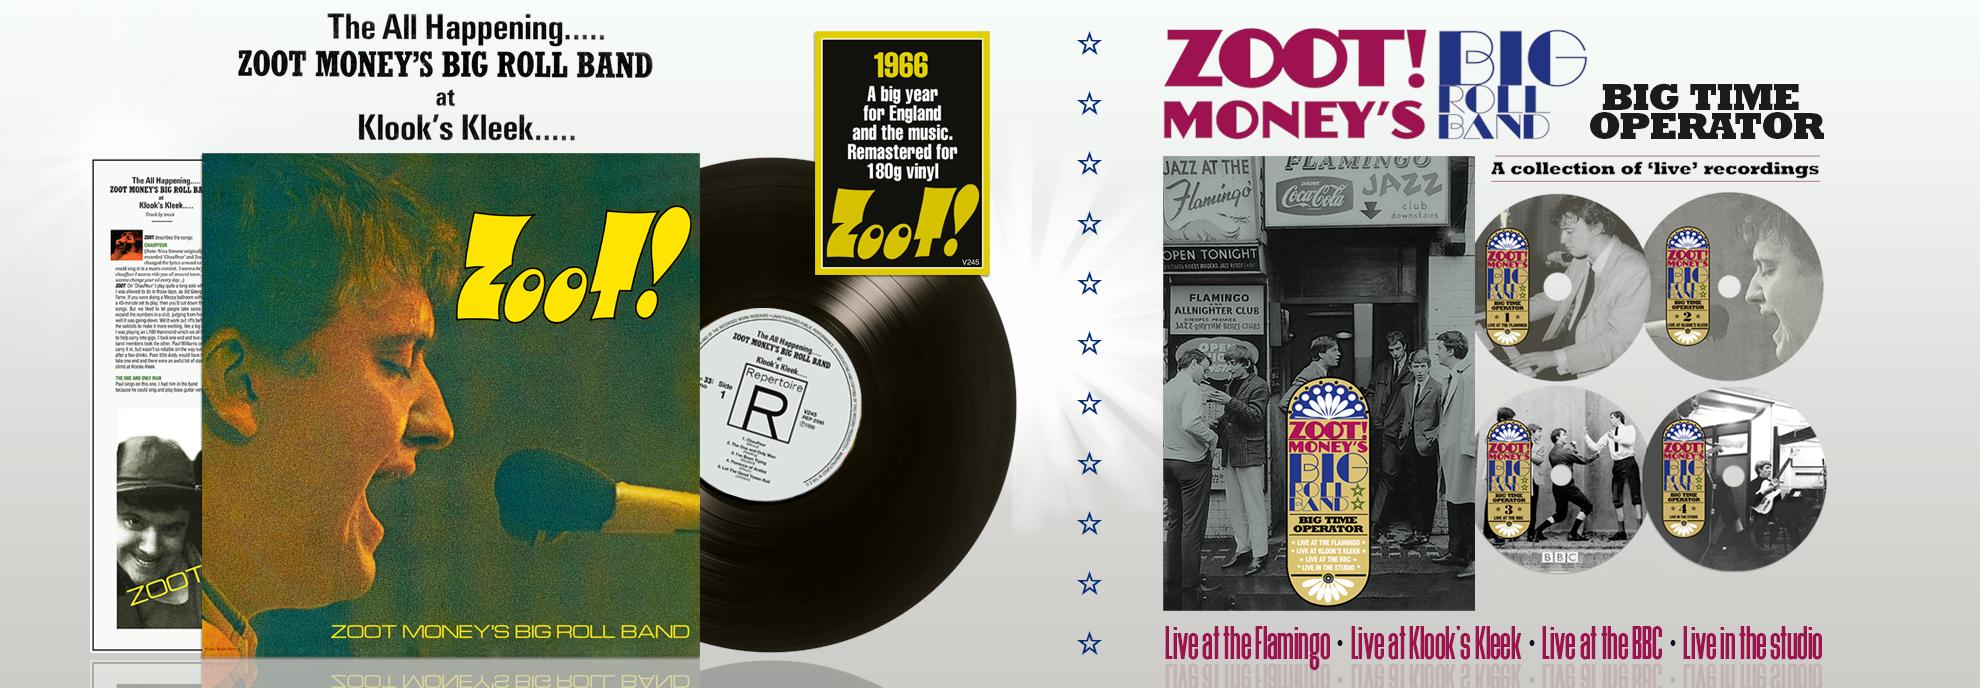 Zoot-banner-new